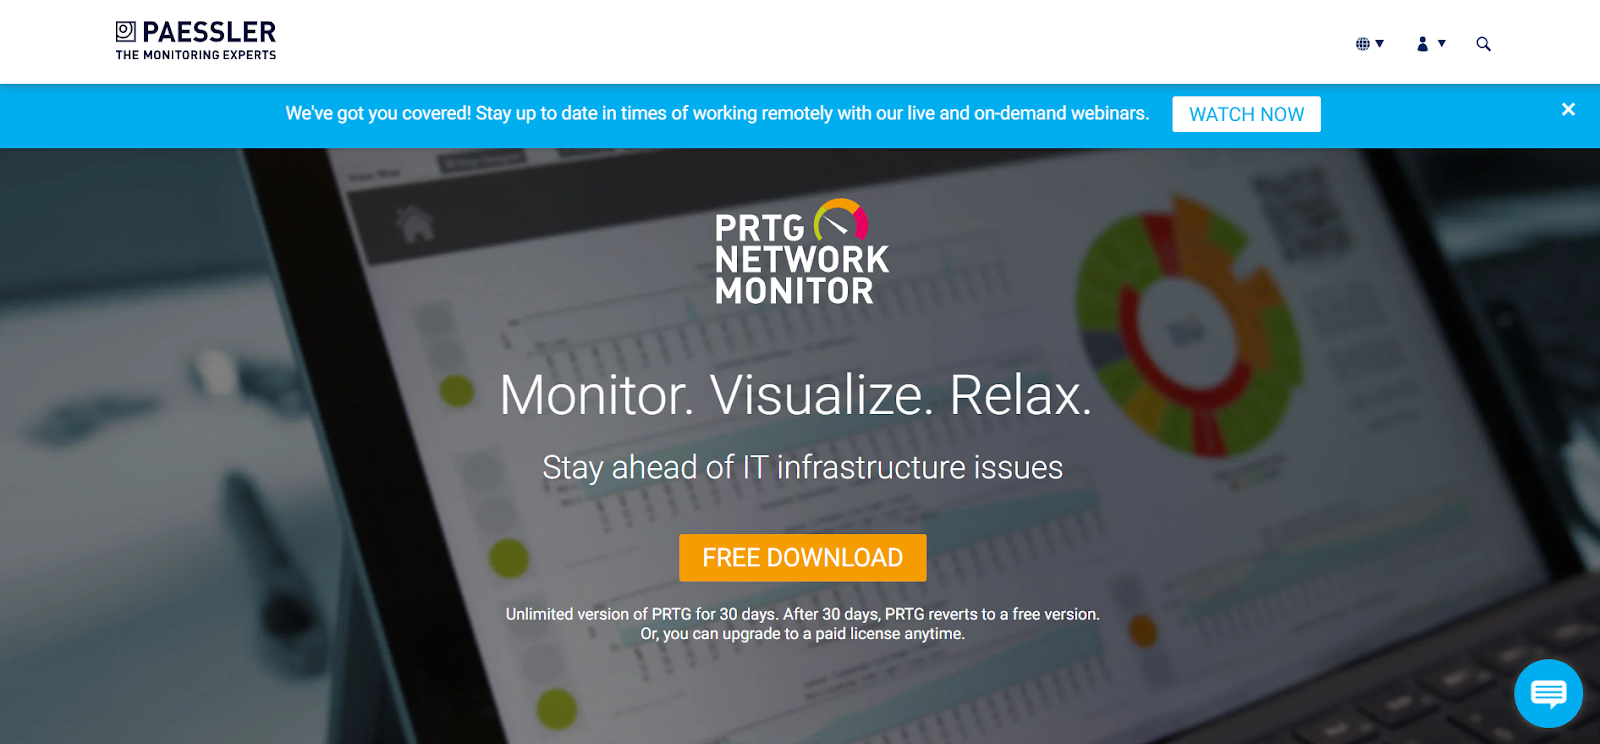 PRTG Network Performance Monitoring Tool